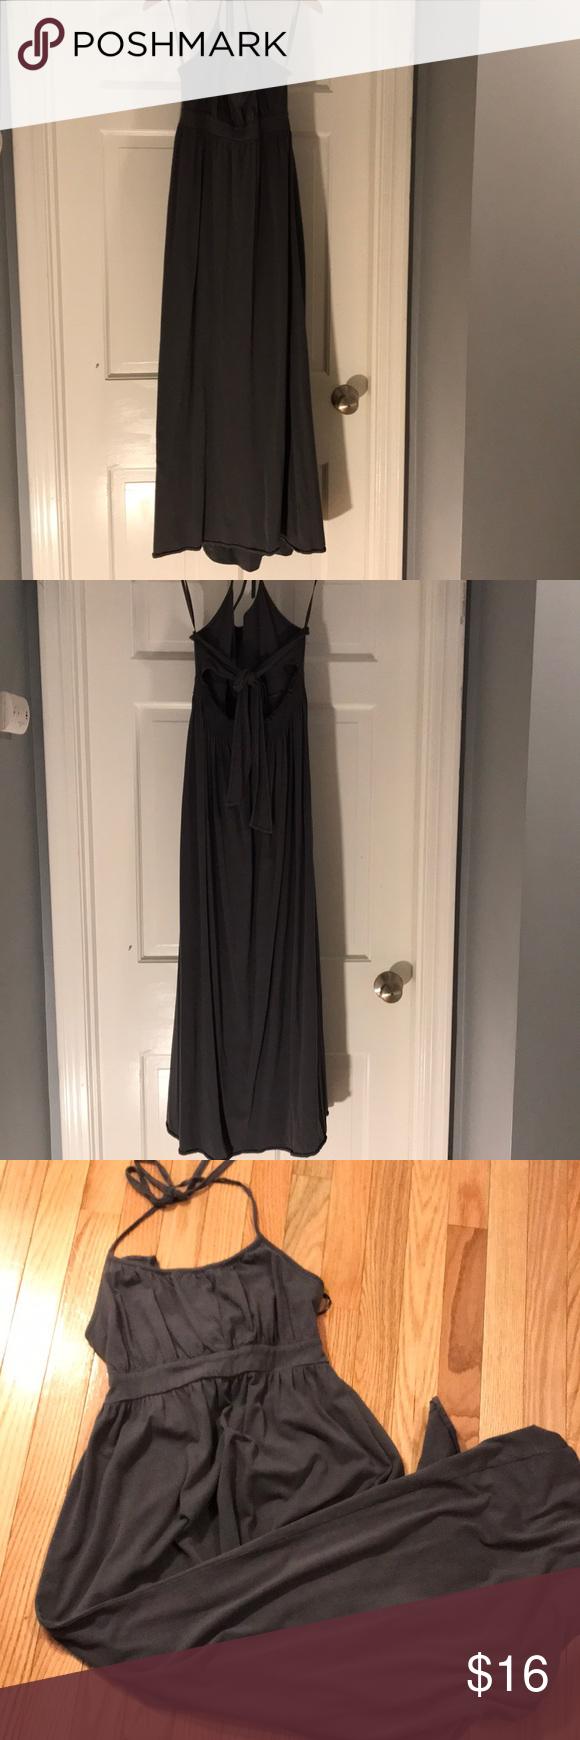 Gap Body Halter Open Stir Back Maxi Dress Clothes Design Nice Dresses Gap Body [ 1740 x 580 Pixel ]